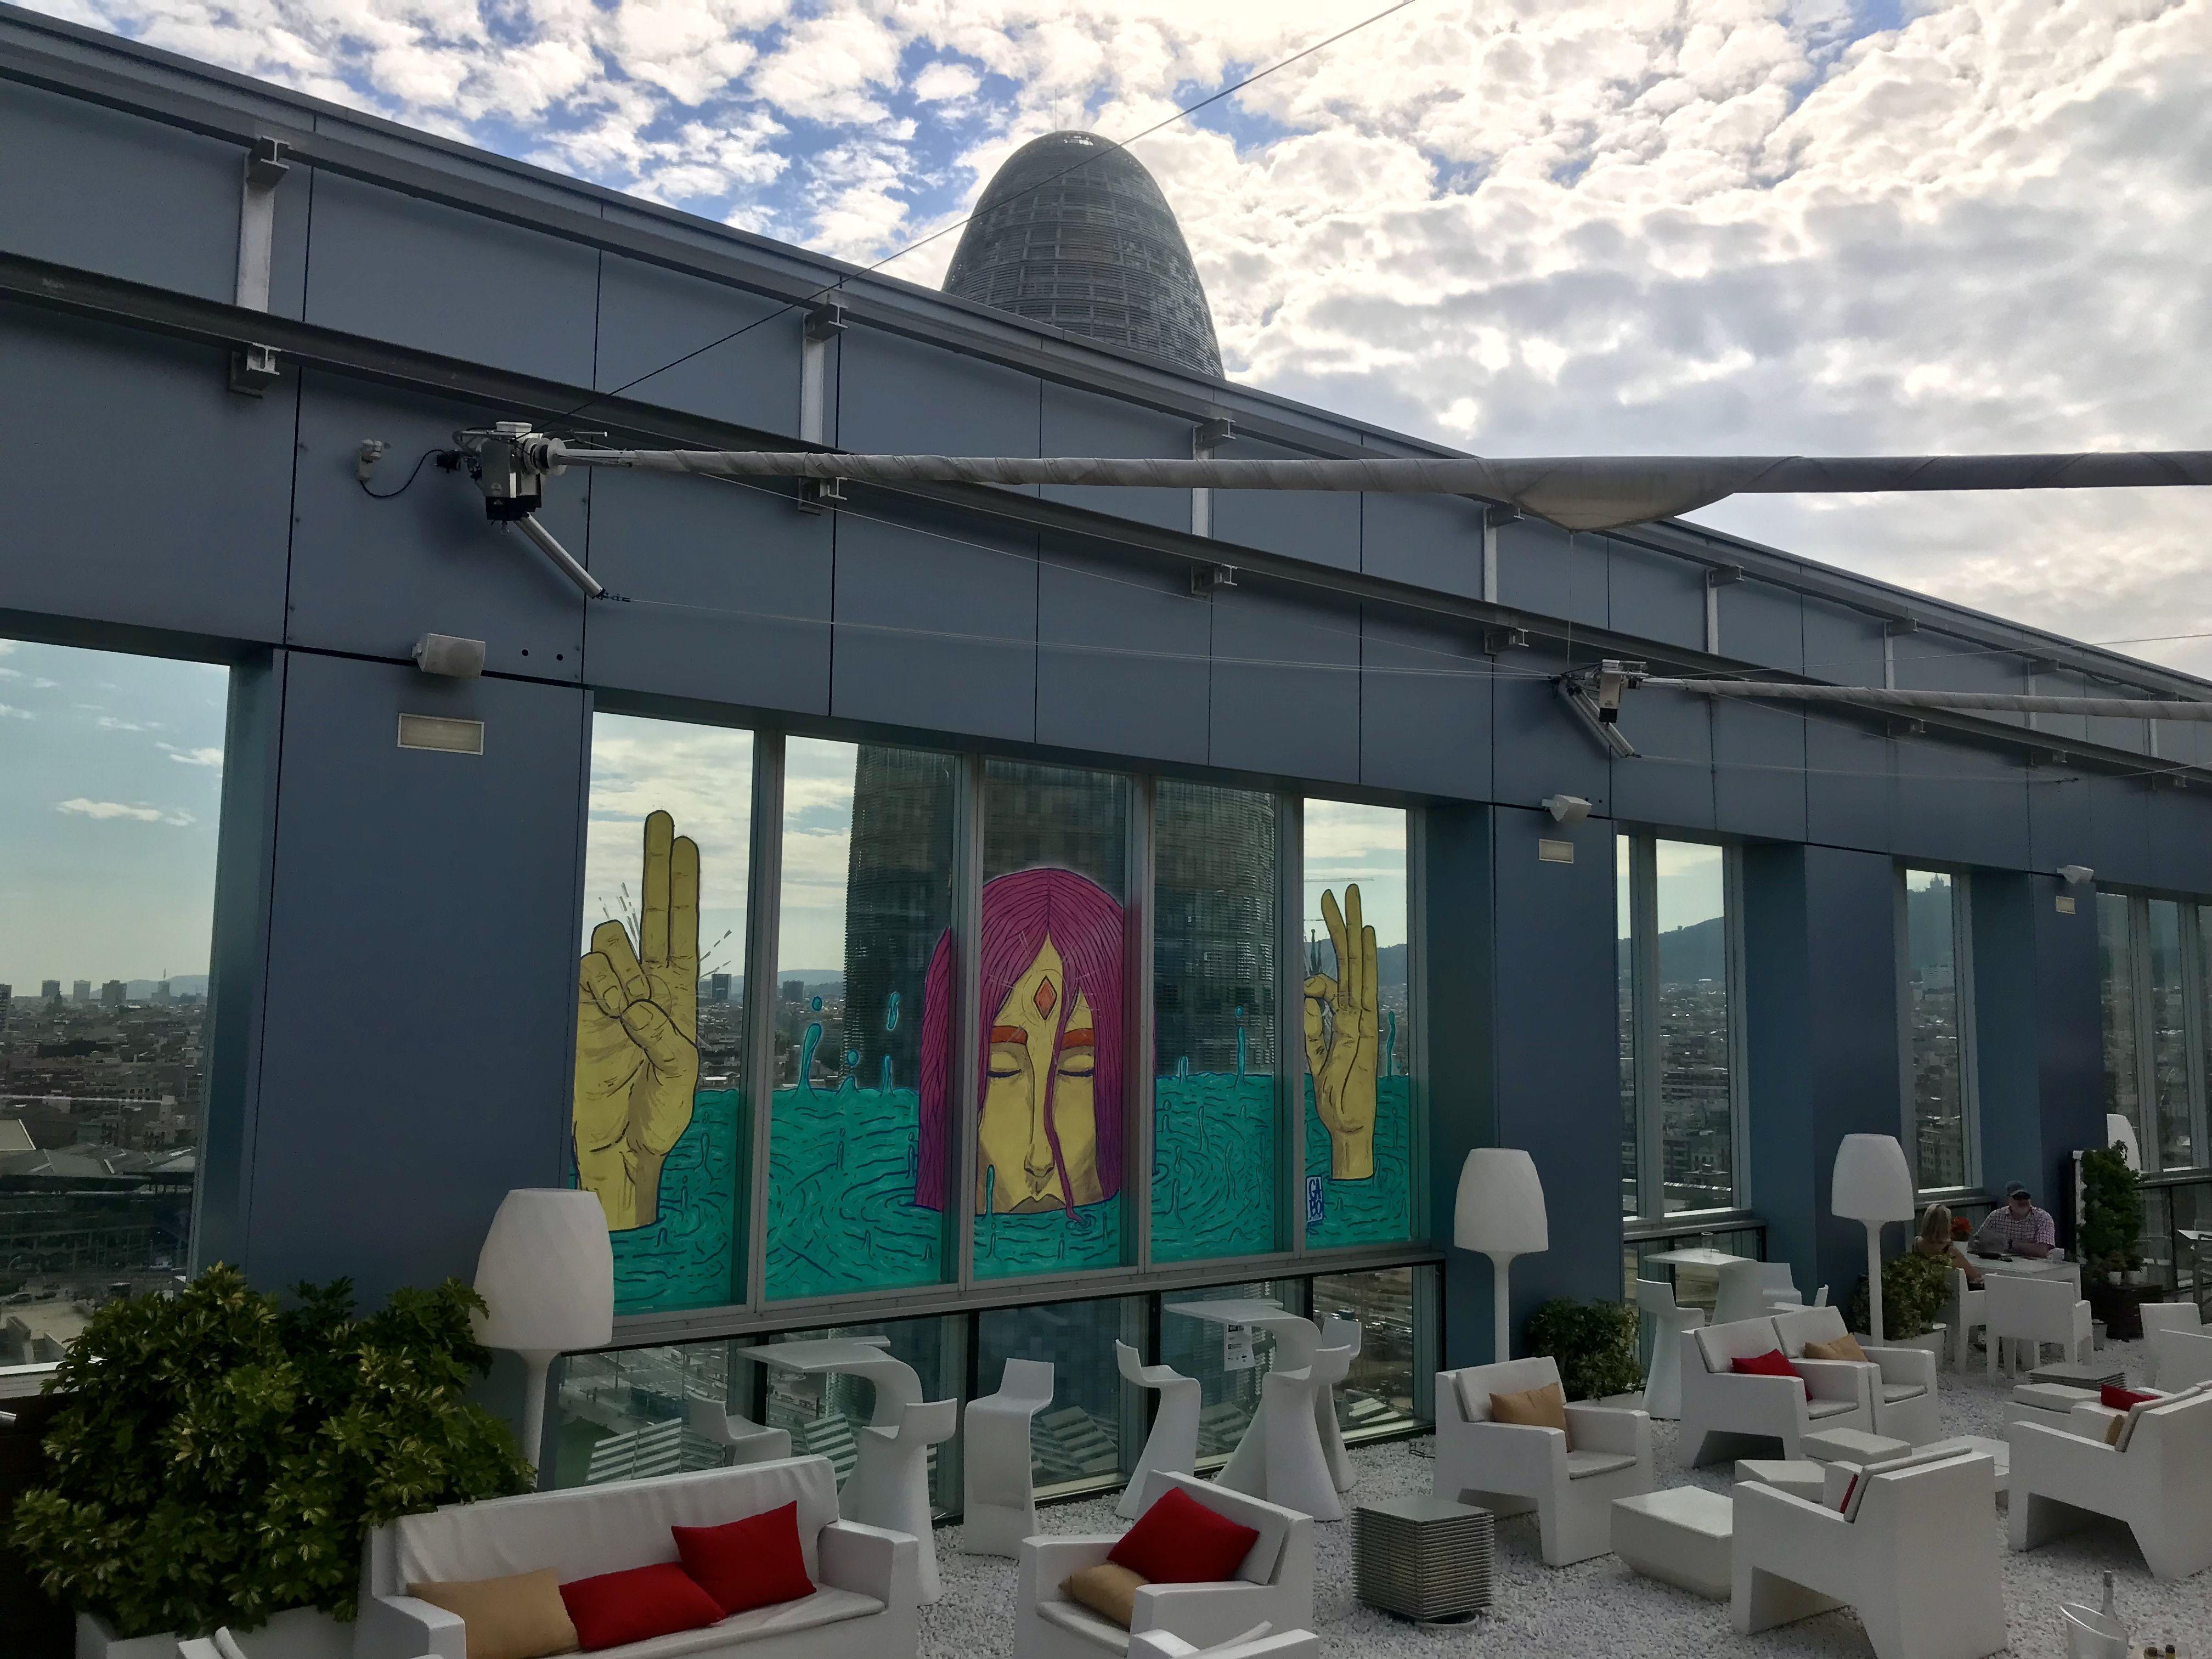 Disfrutar de un hotel con piscina en barcelona street food terrace - Hotel piscina barcellona ...